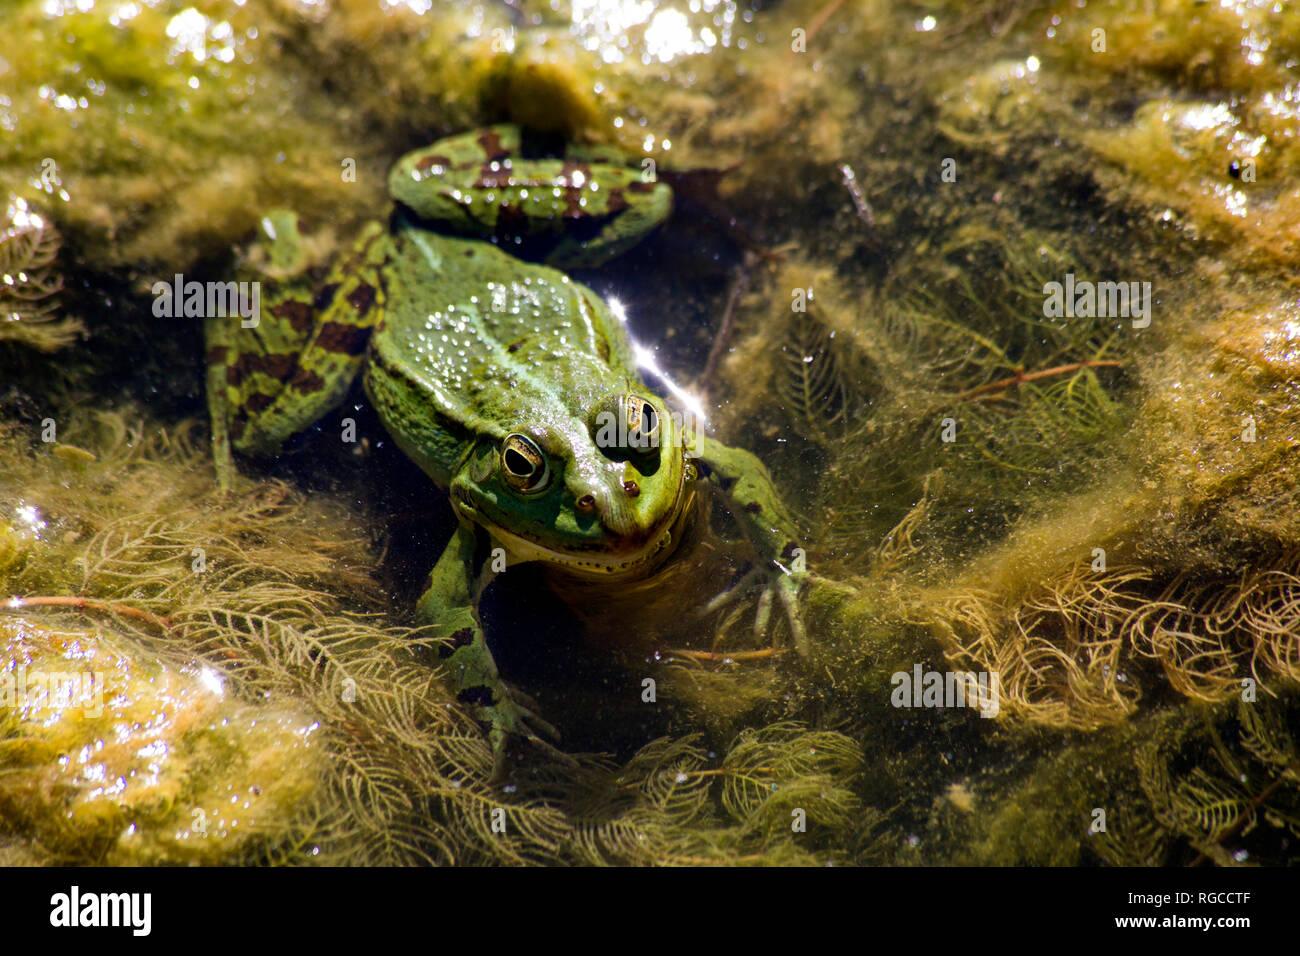 Pool frog, Rana esculenta - Stock Image